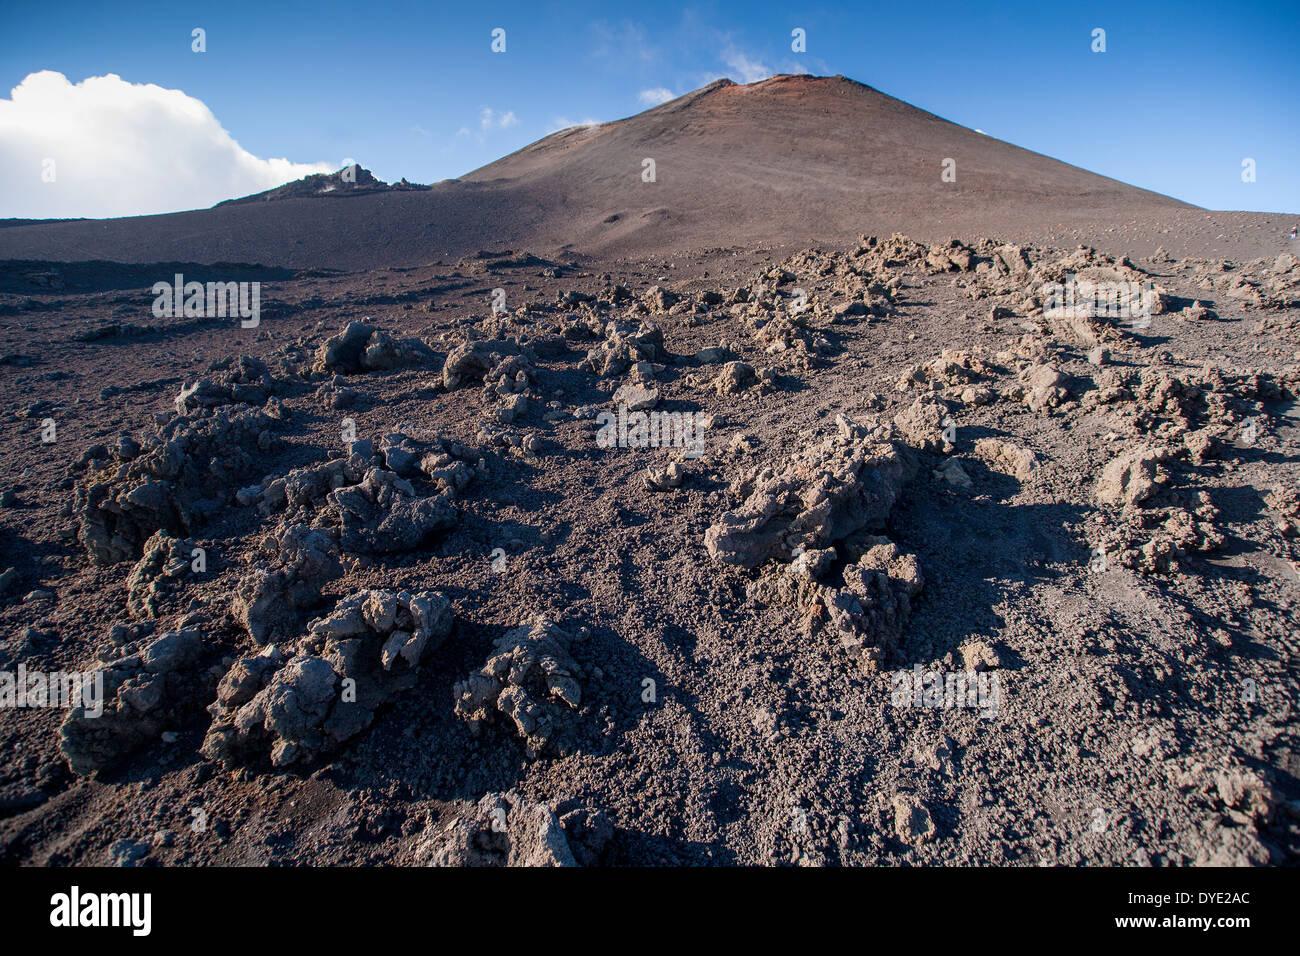 Slopes of Mount Etna Sicily. - Stock Image